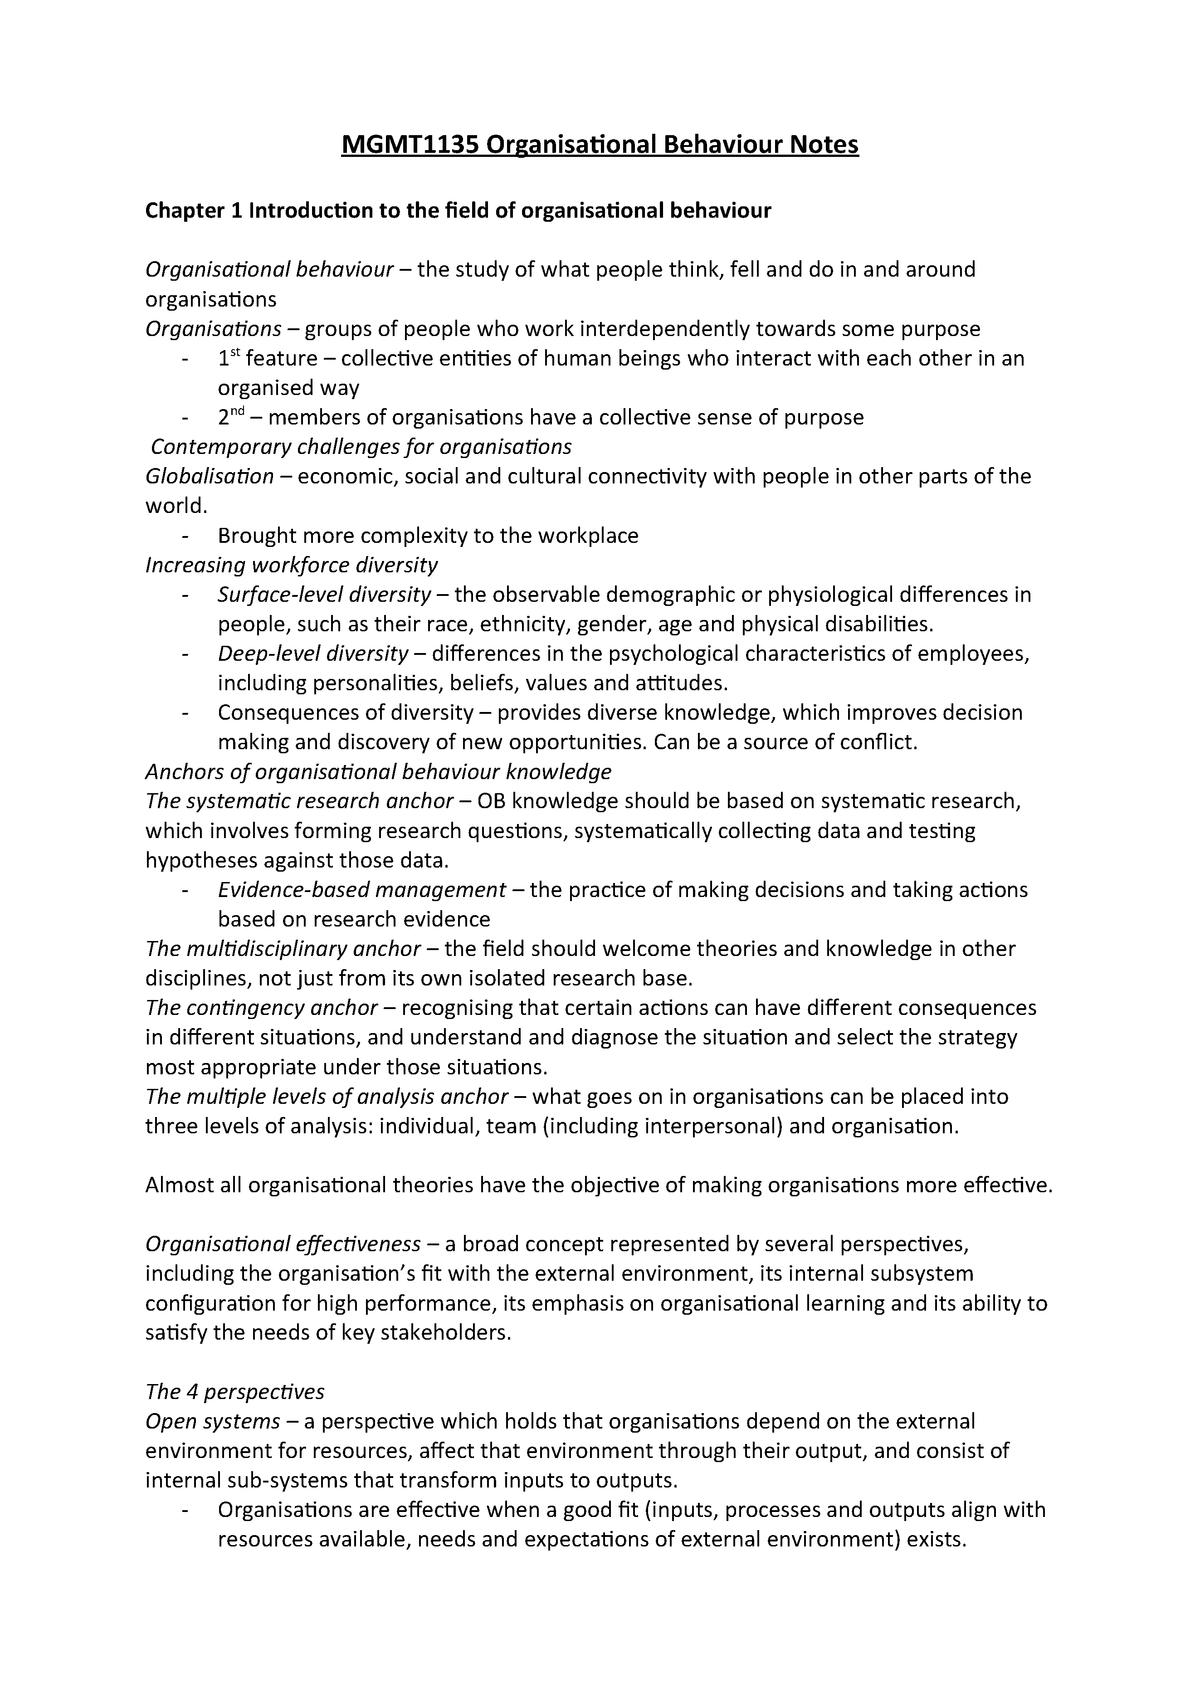 MGMT1135 Organisational Behaviour Comprehensive Notes